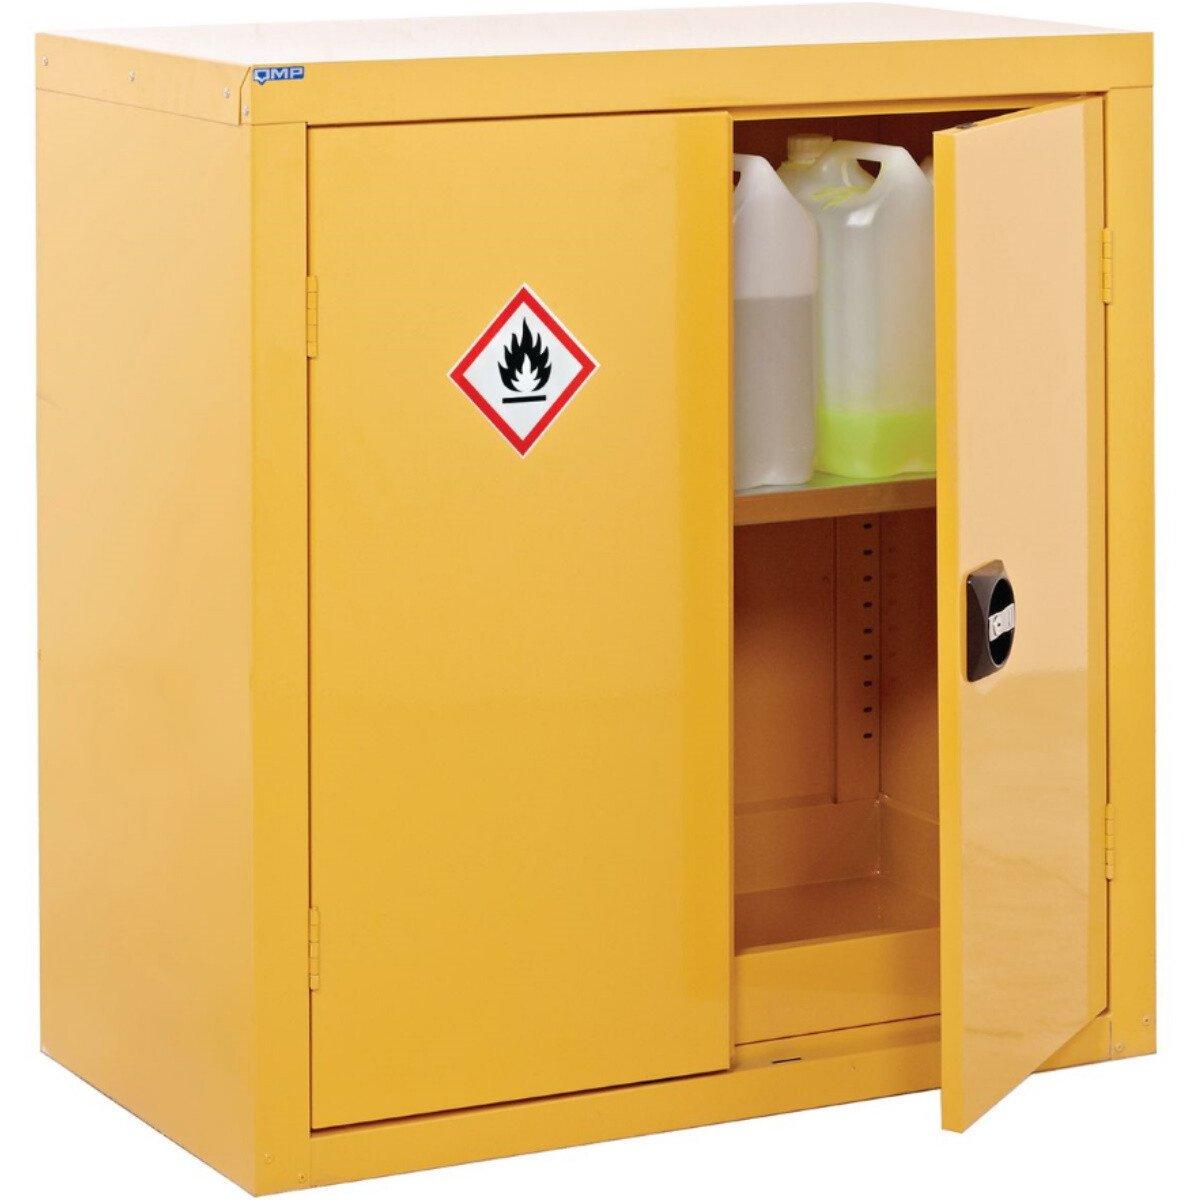 QMP CZ709046 Hazardous Substance Cupboard 700 x 900 x 460mm